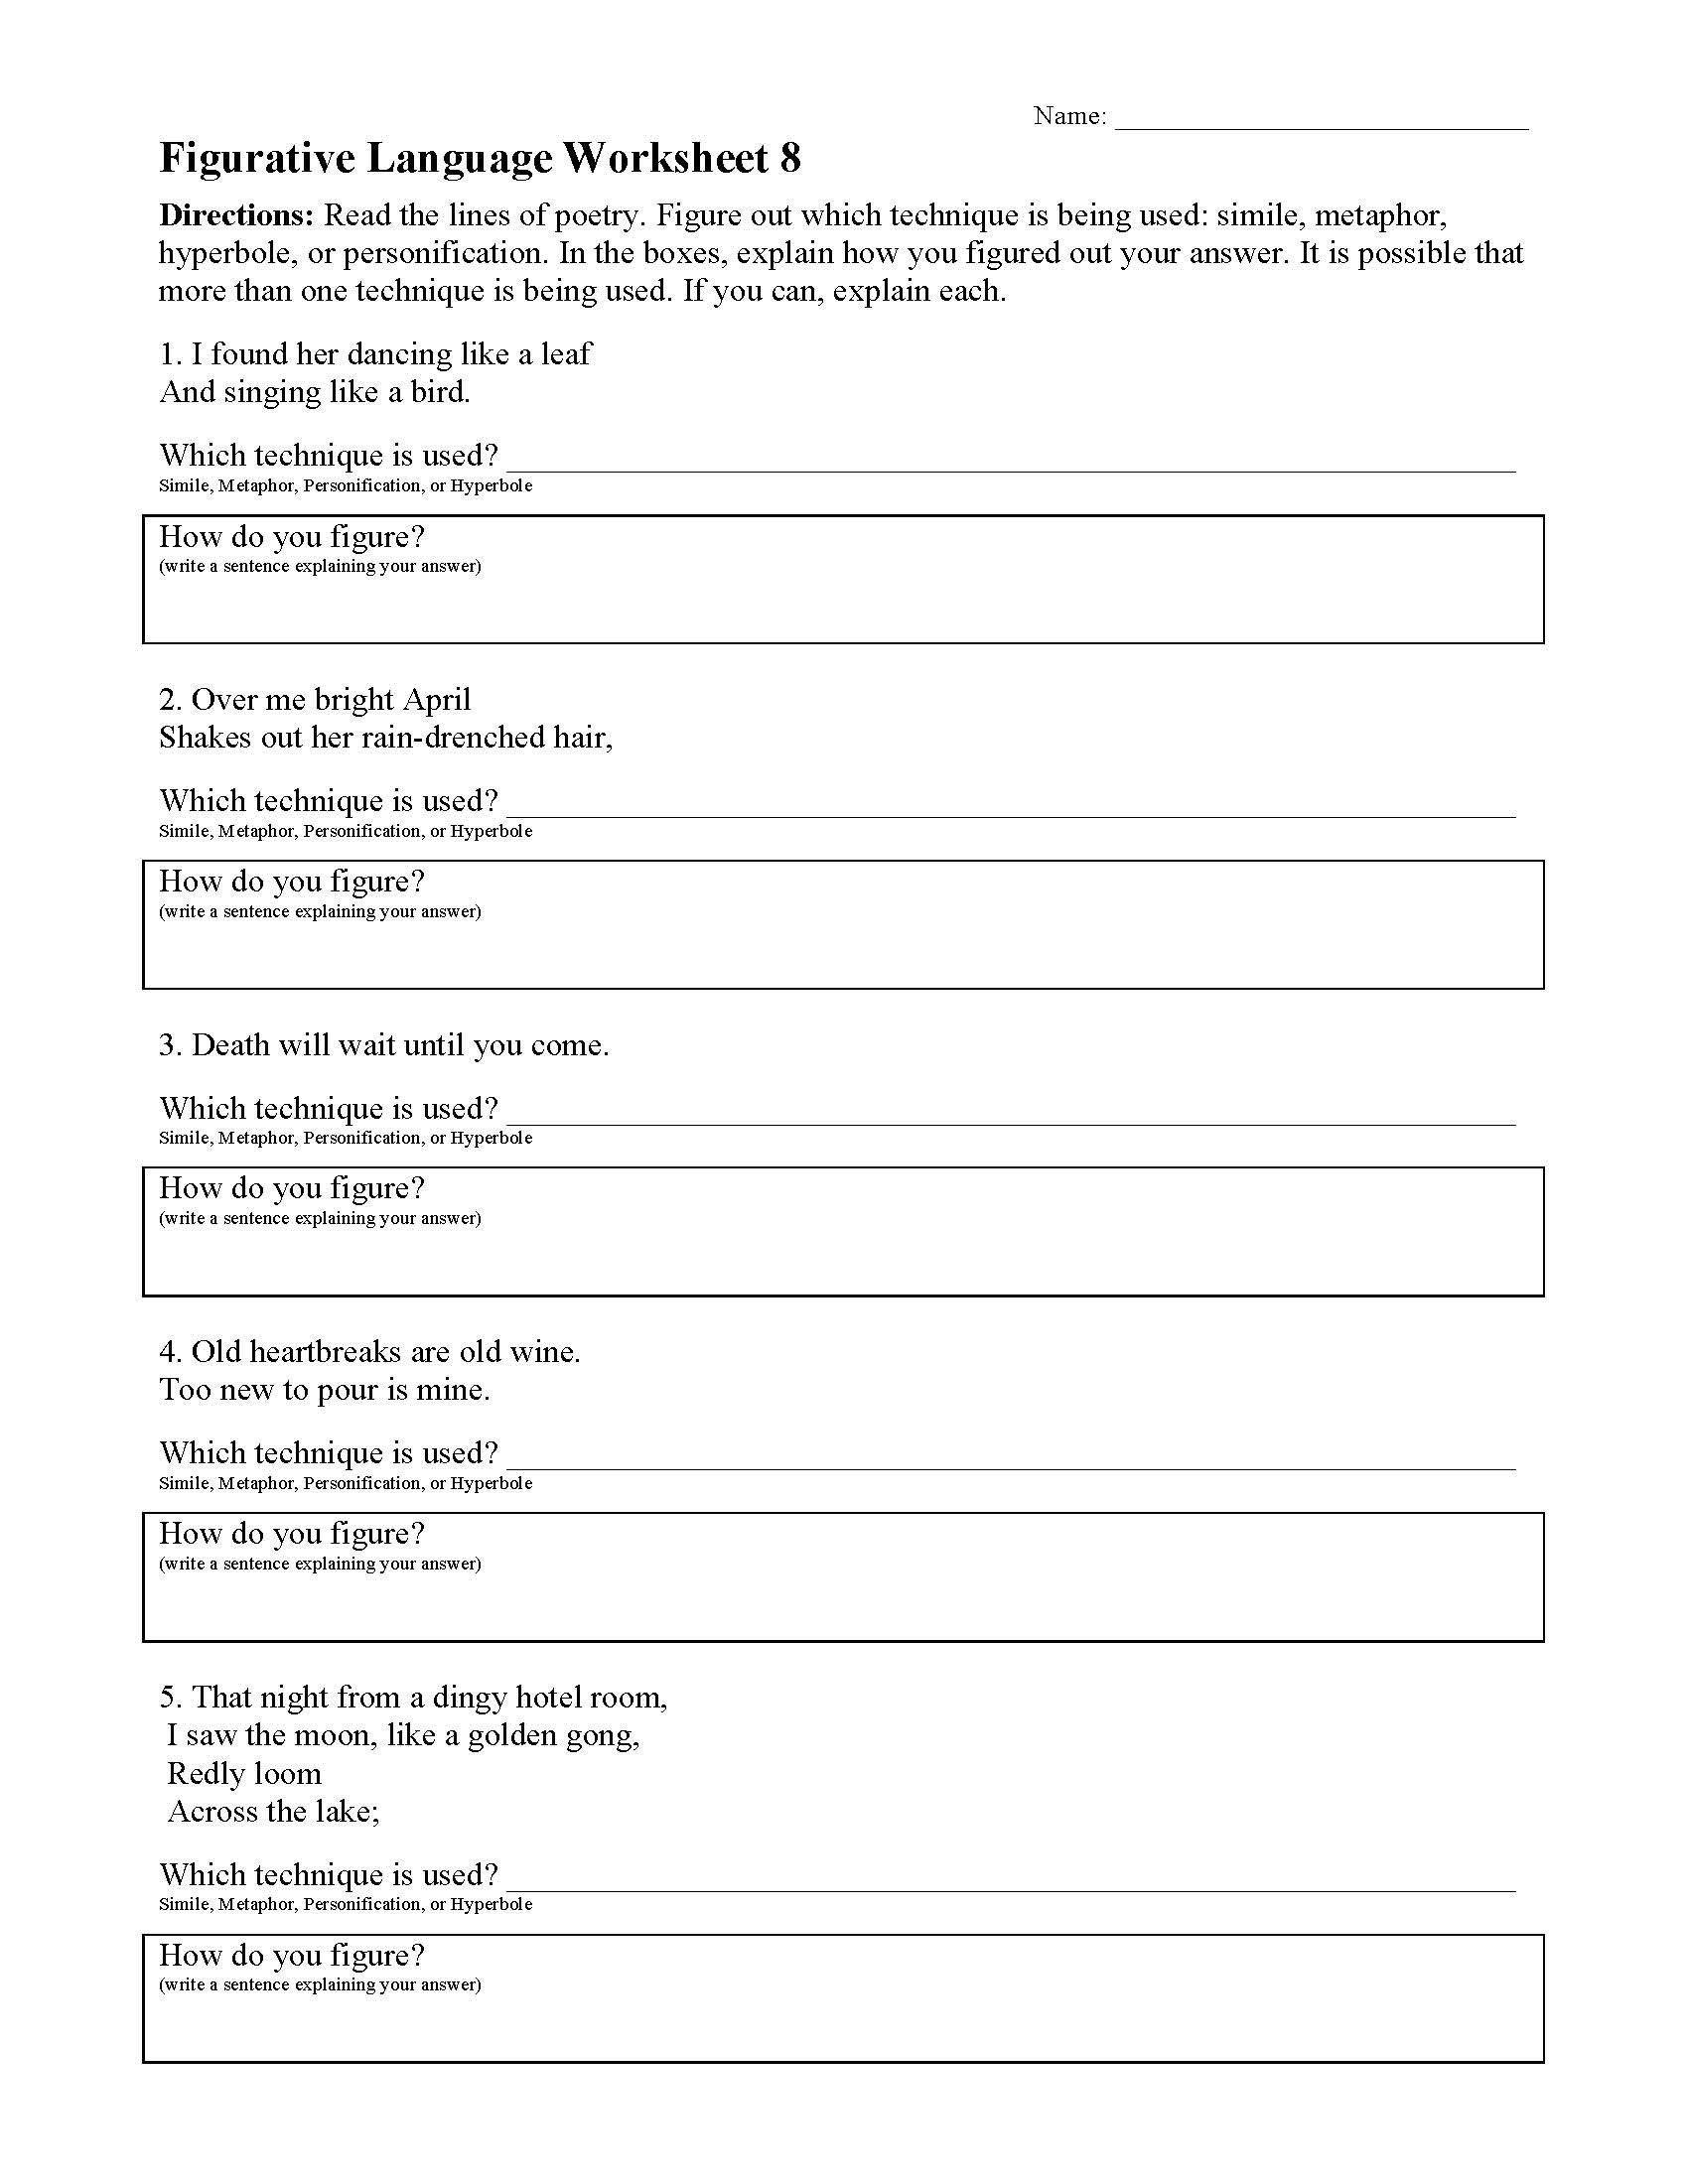 Figurative Language 5th Grade Worksheets Figurative Language Worksheets In 2020 Language Worksheets Poetry Worksheets Figurative Language Worksheet